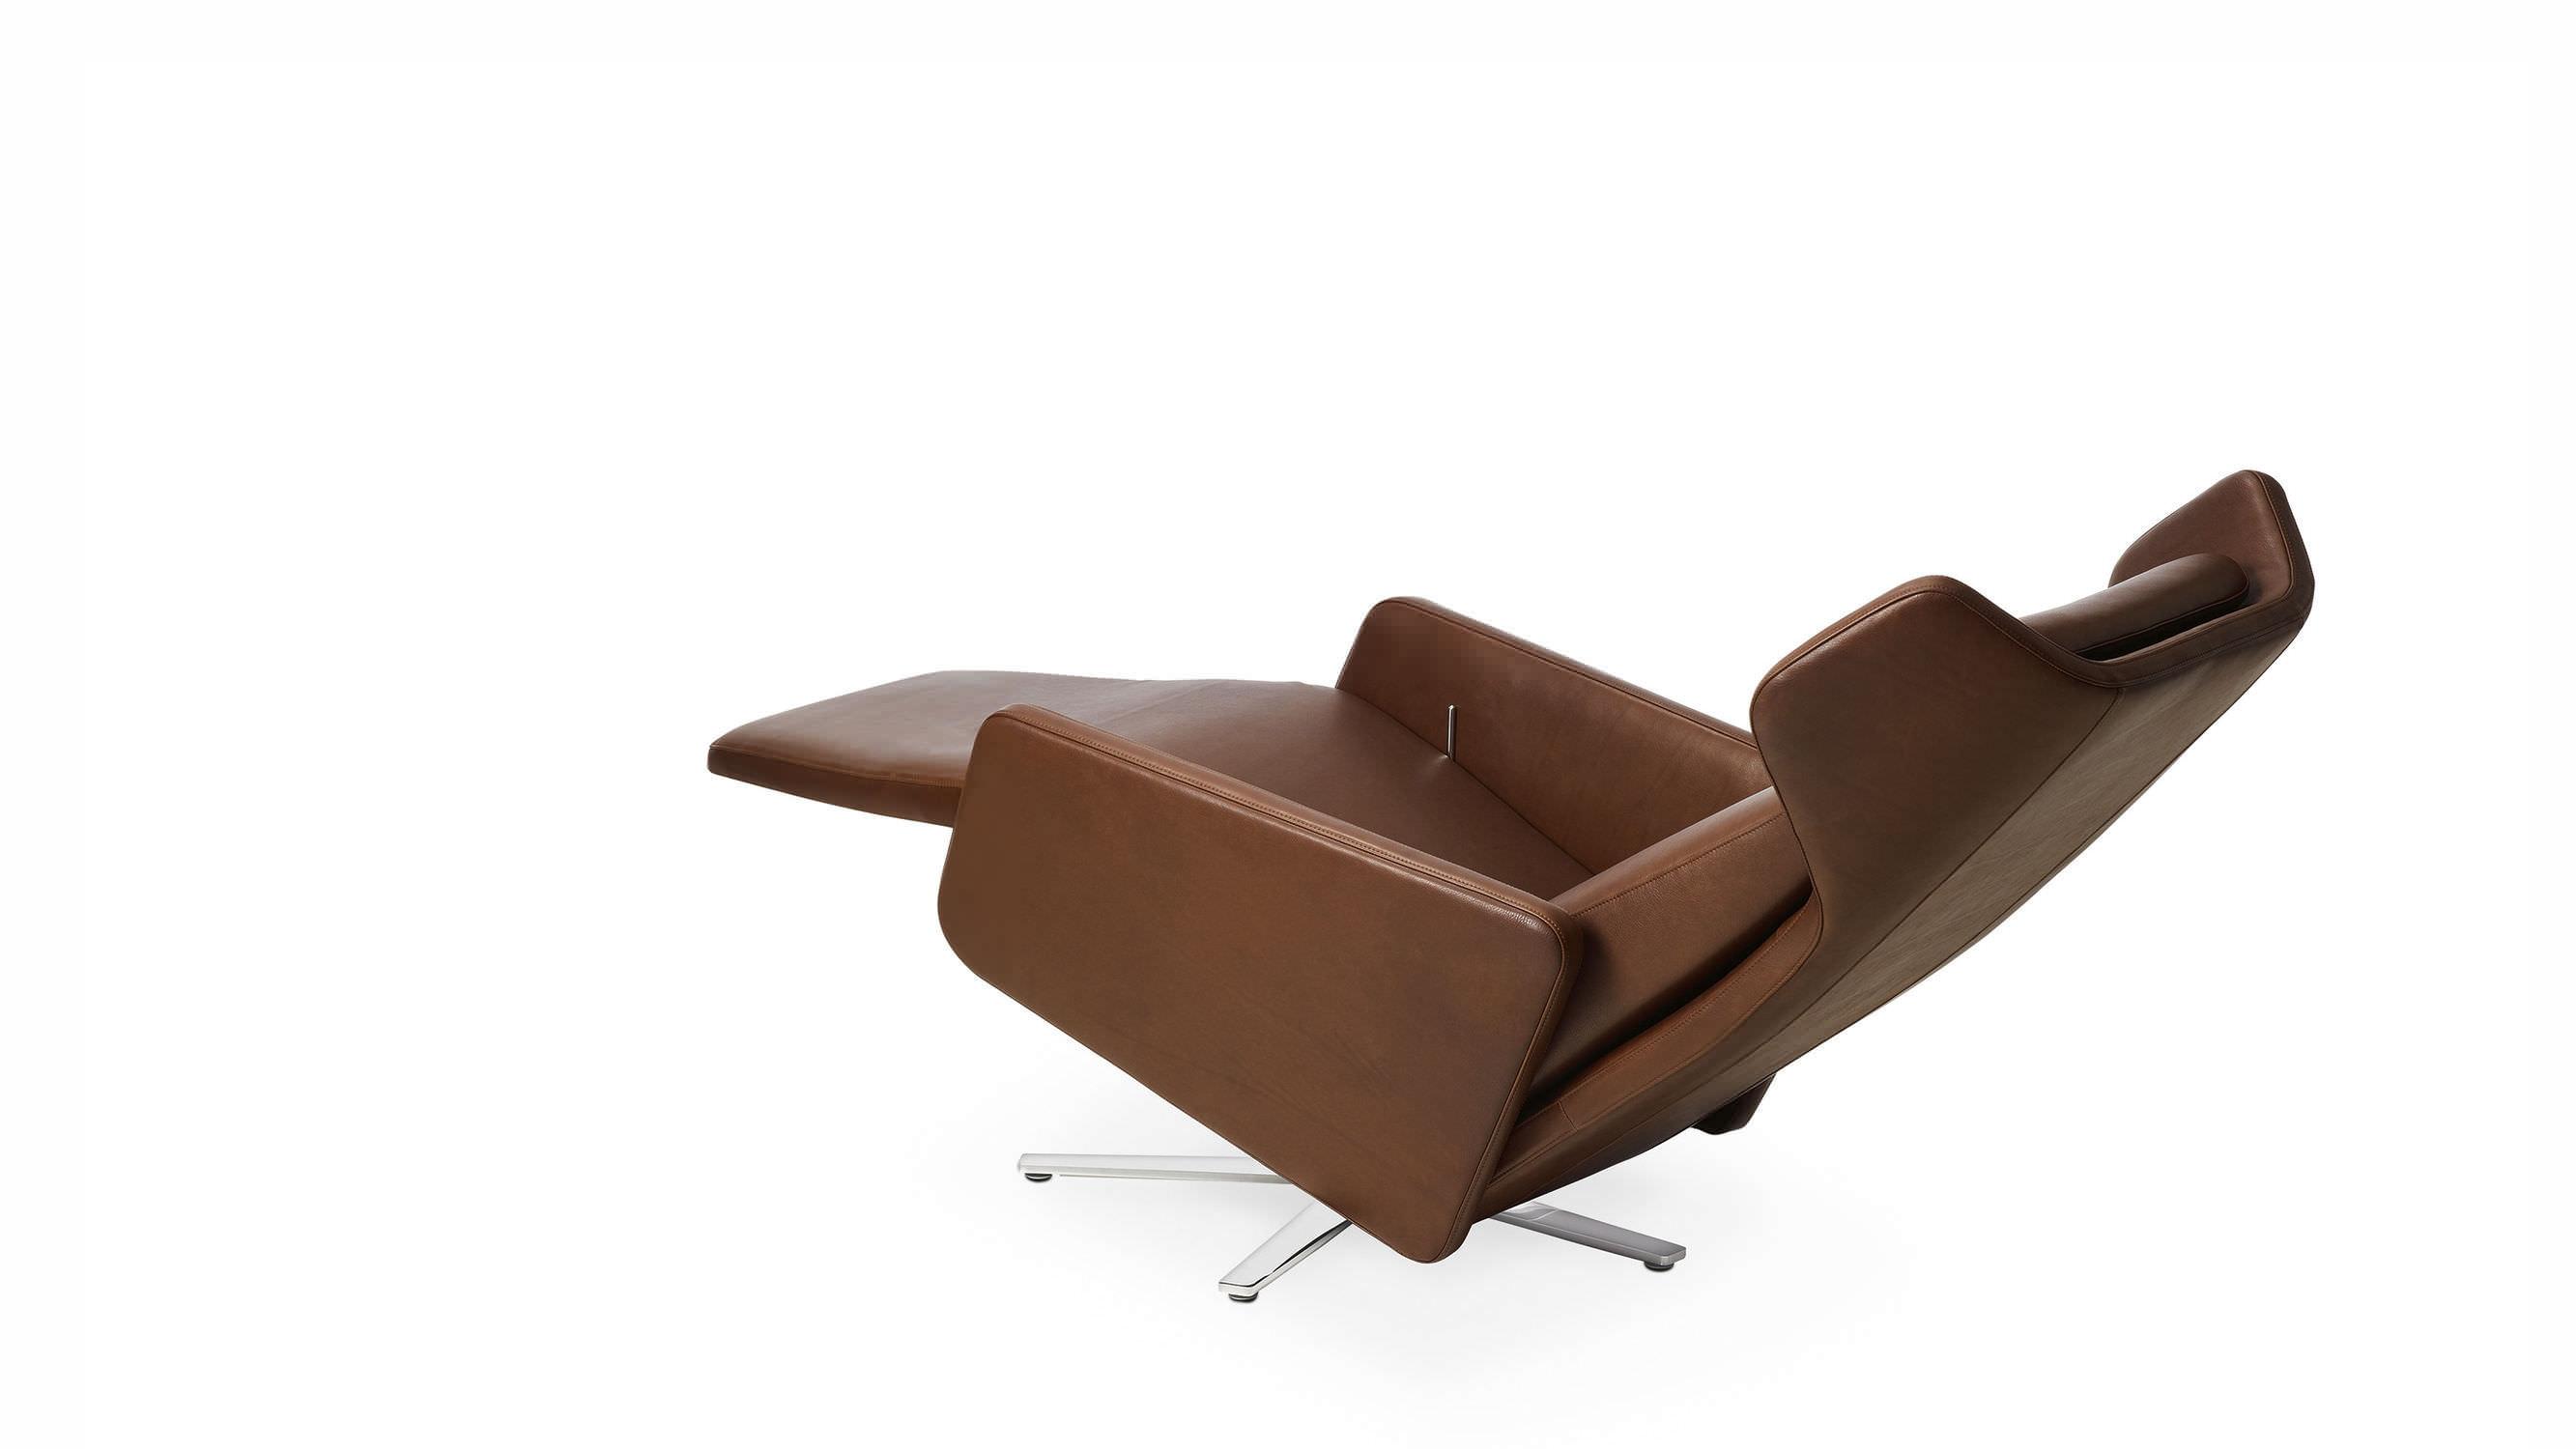 Relaxsessel elektrisch verstellbar  Moderner Sessel / Stoff / Leder / verstellbar - 1303 NANO by ...